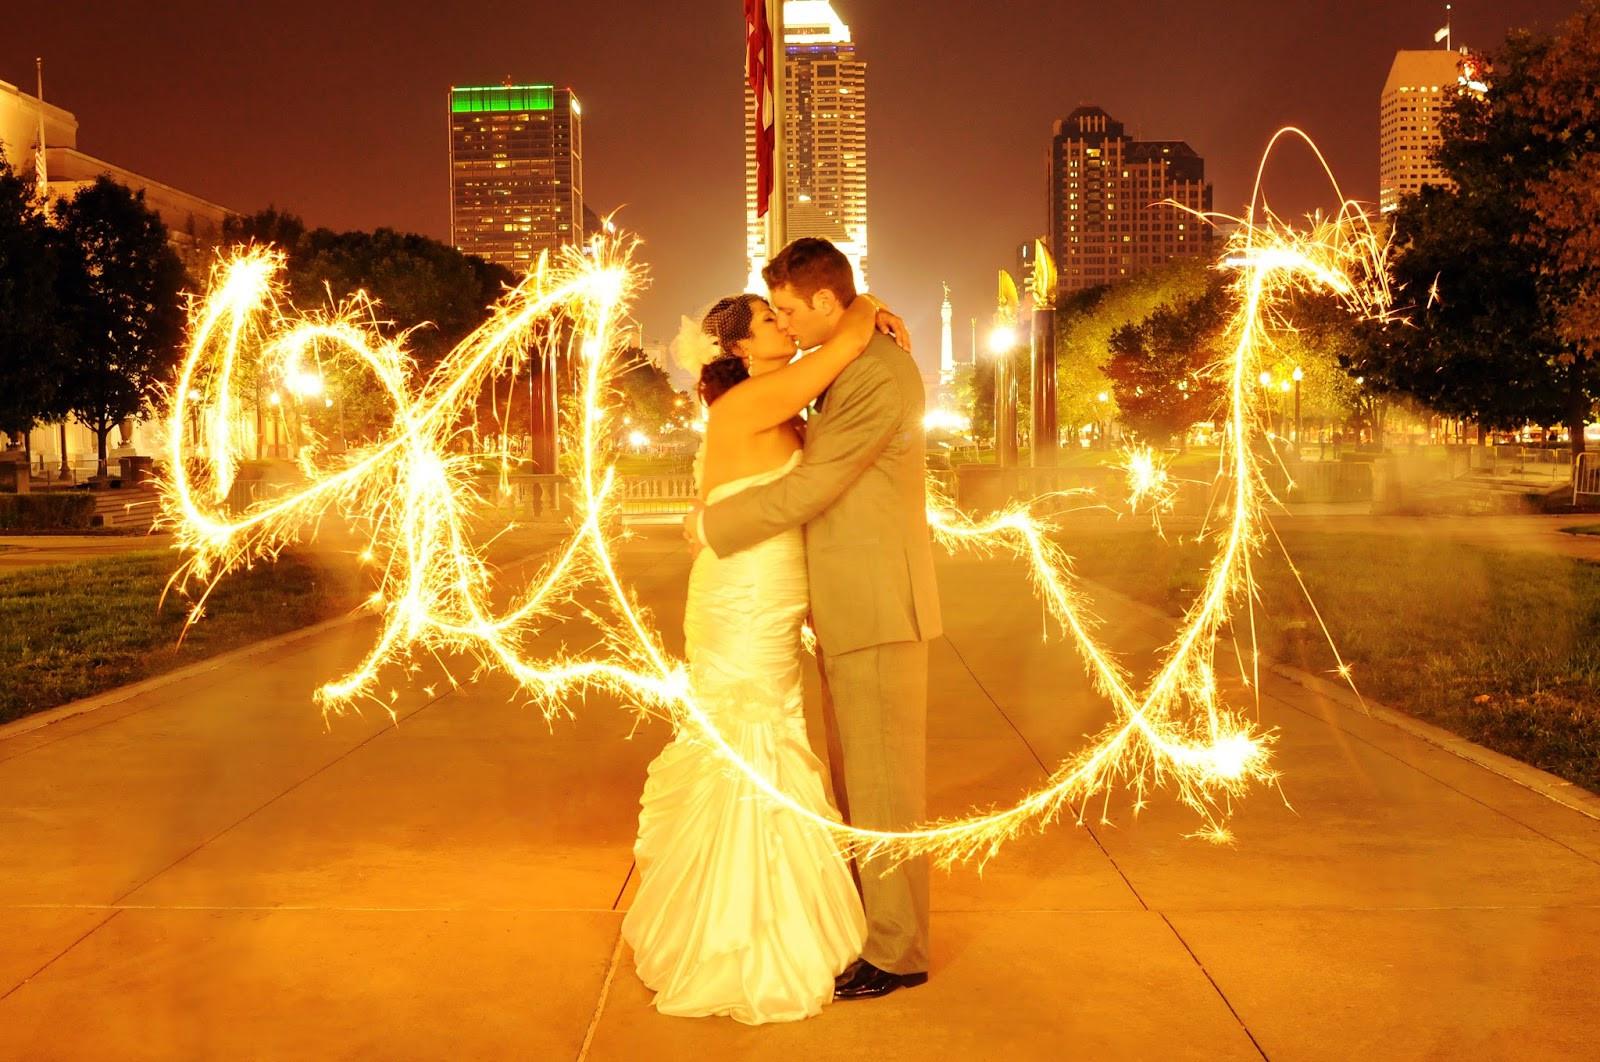 Wedding Sparkler  ViP Wedding Sparklers Writing With Wedding Sparklers